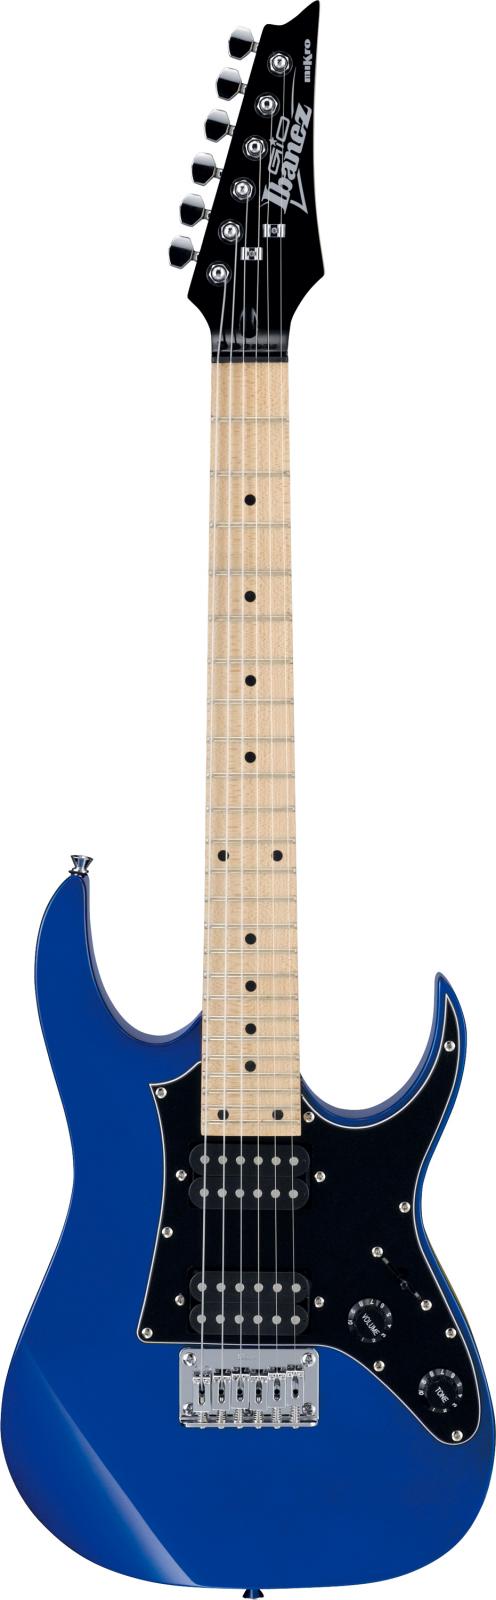 Ibanez GIO RG miKro 6str Electric Guitar - Jewel Blue